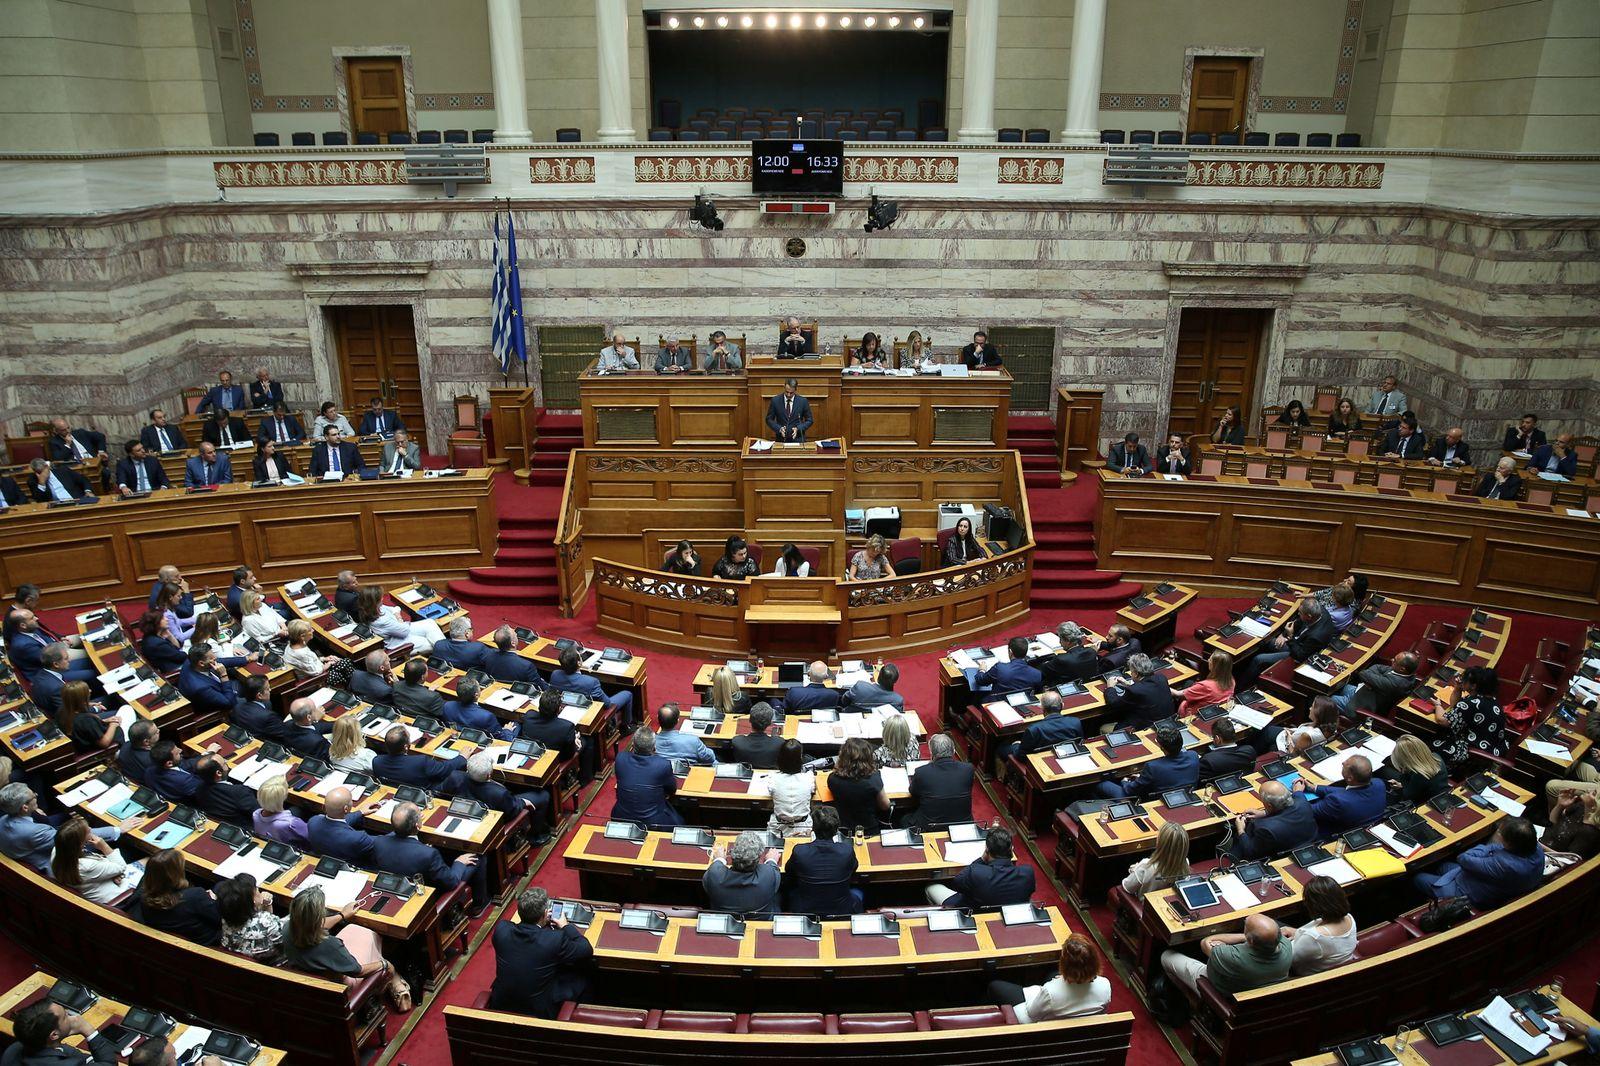 GREECE-PARLIAMENT/UNIVERSITY-ASYLUM